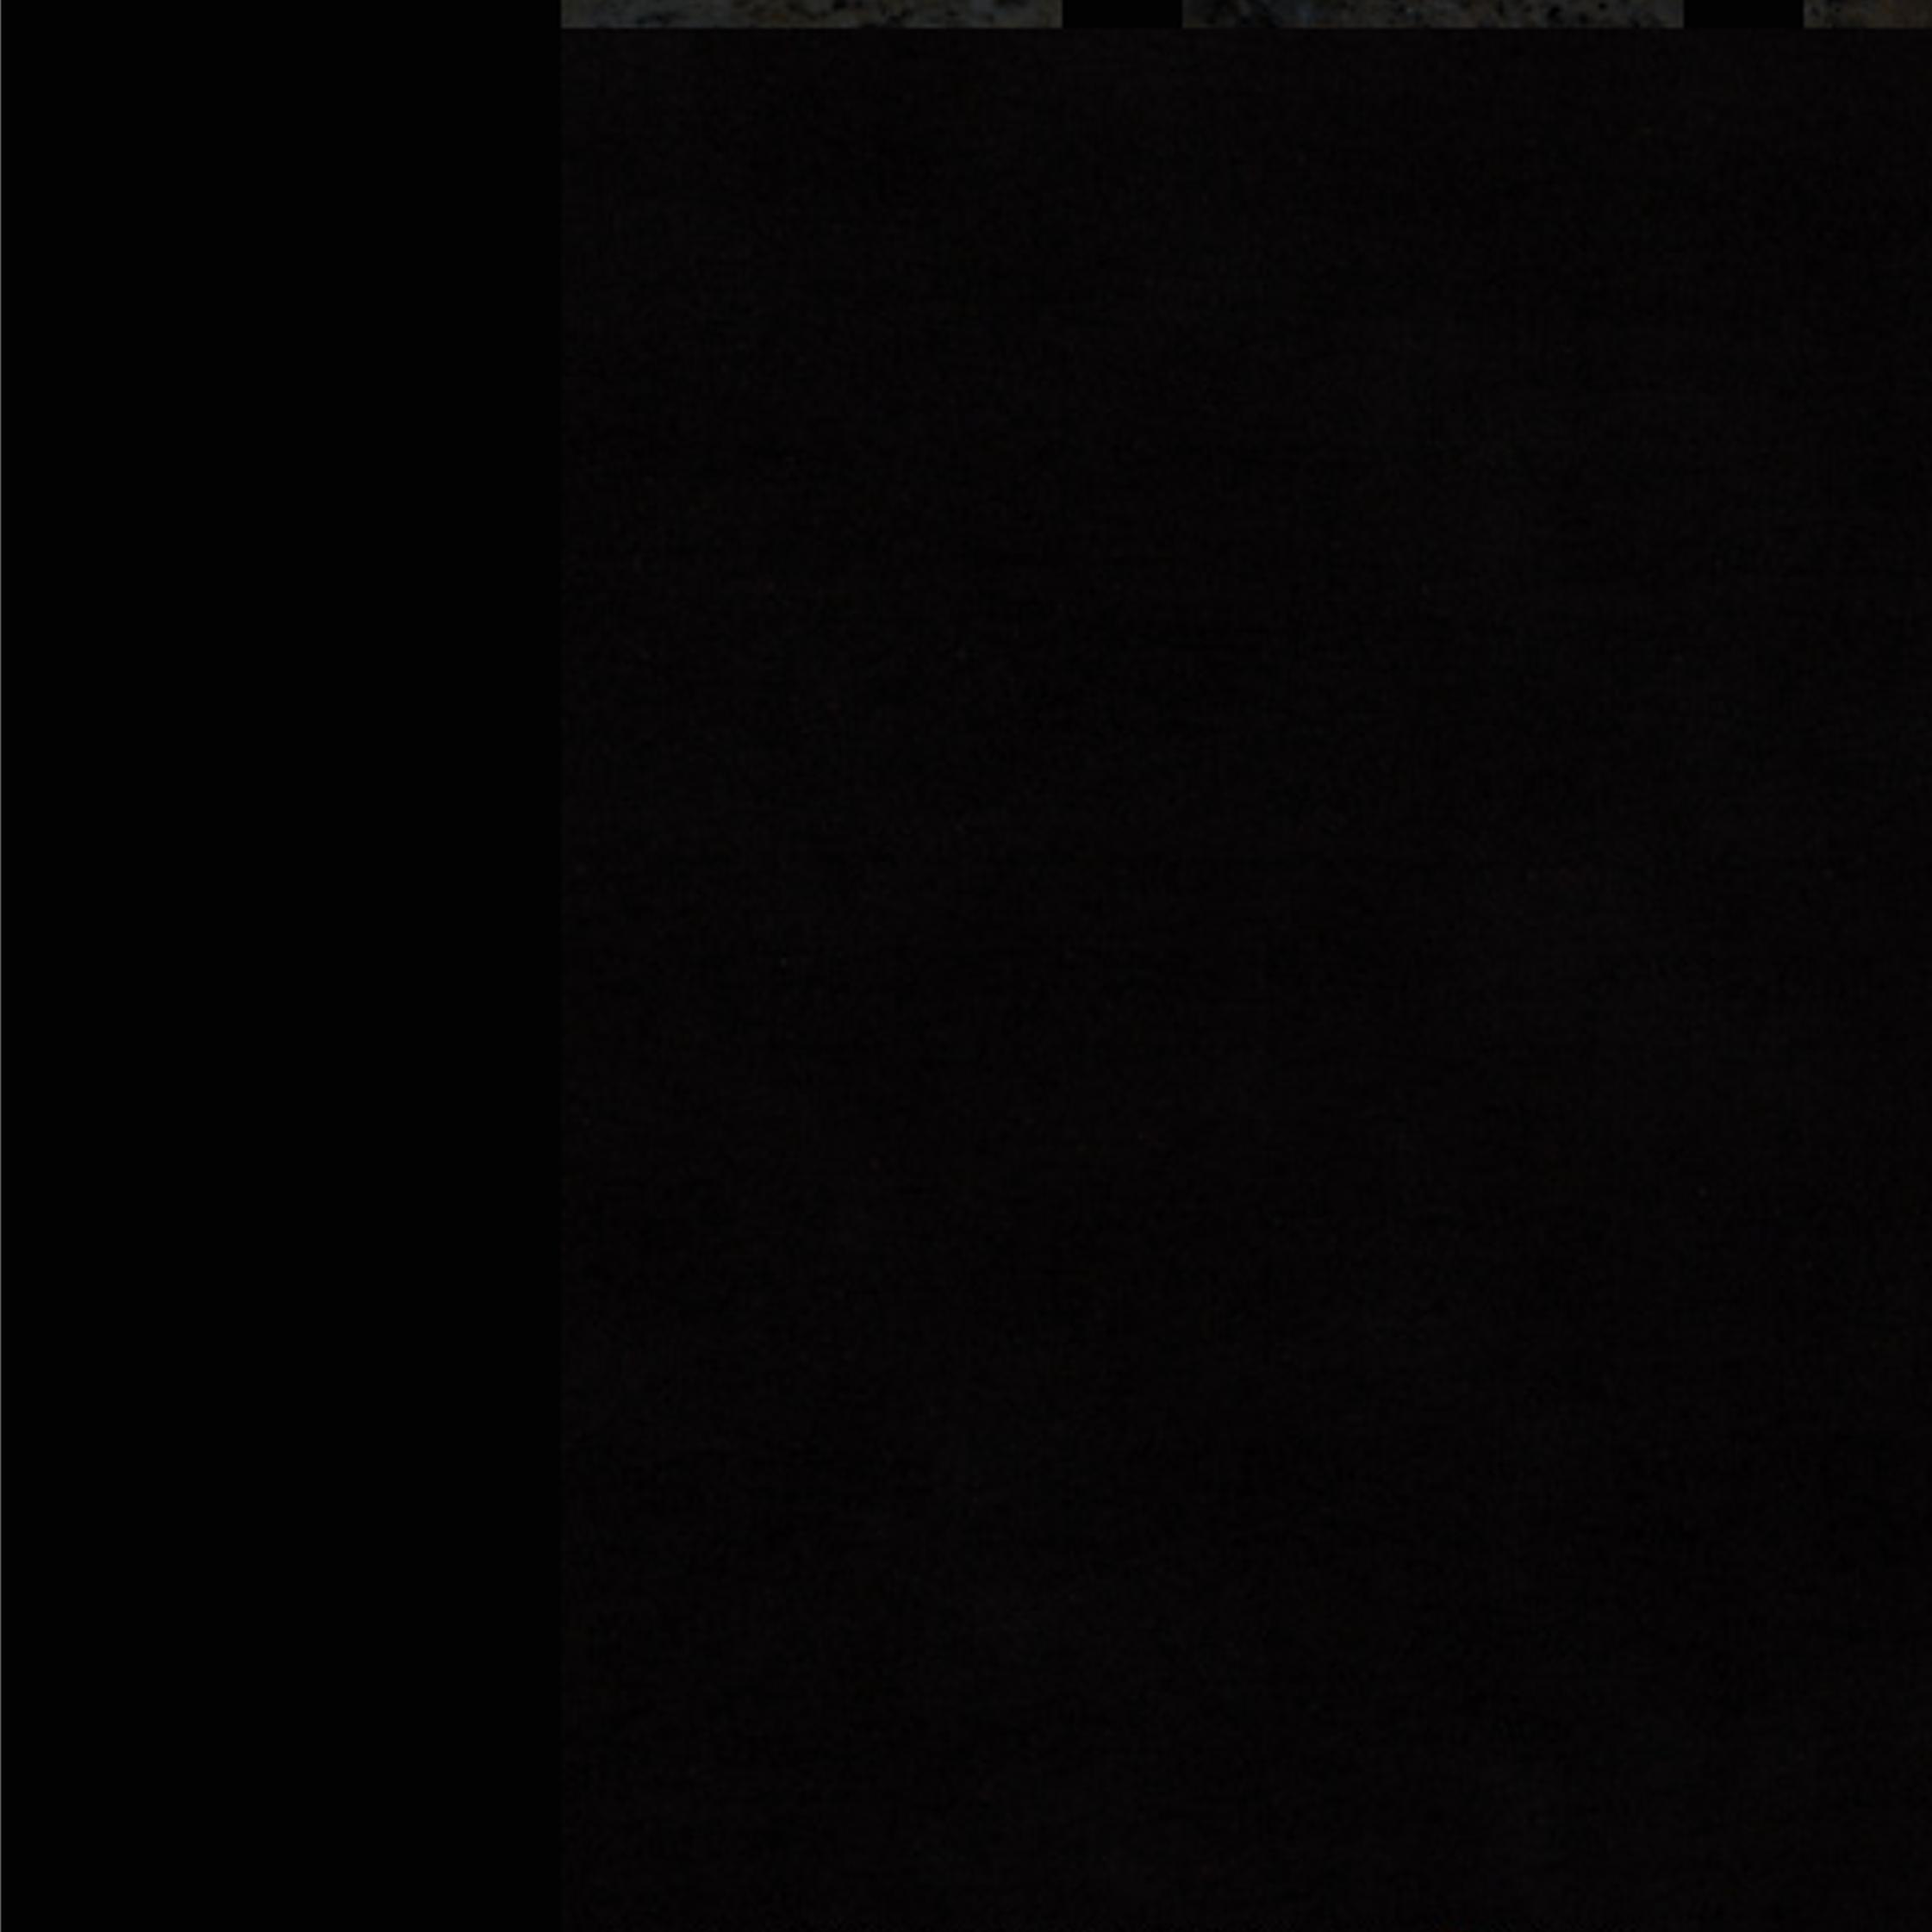 polished black granite texture. Jet Black Polished Granite Texture